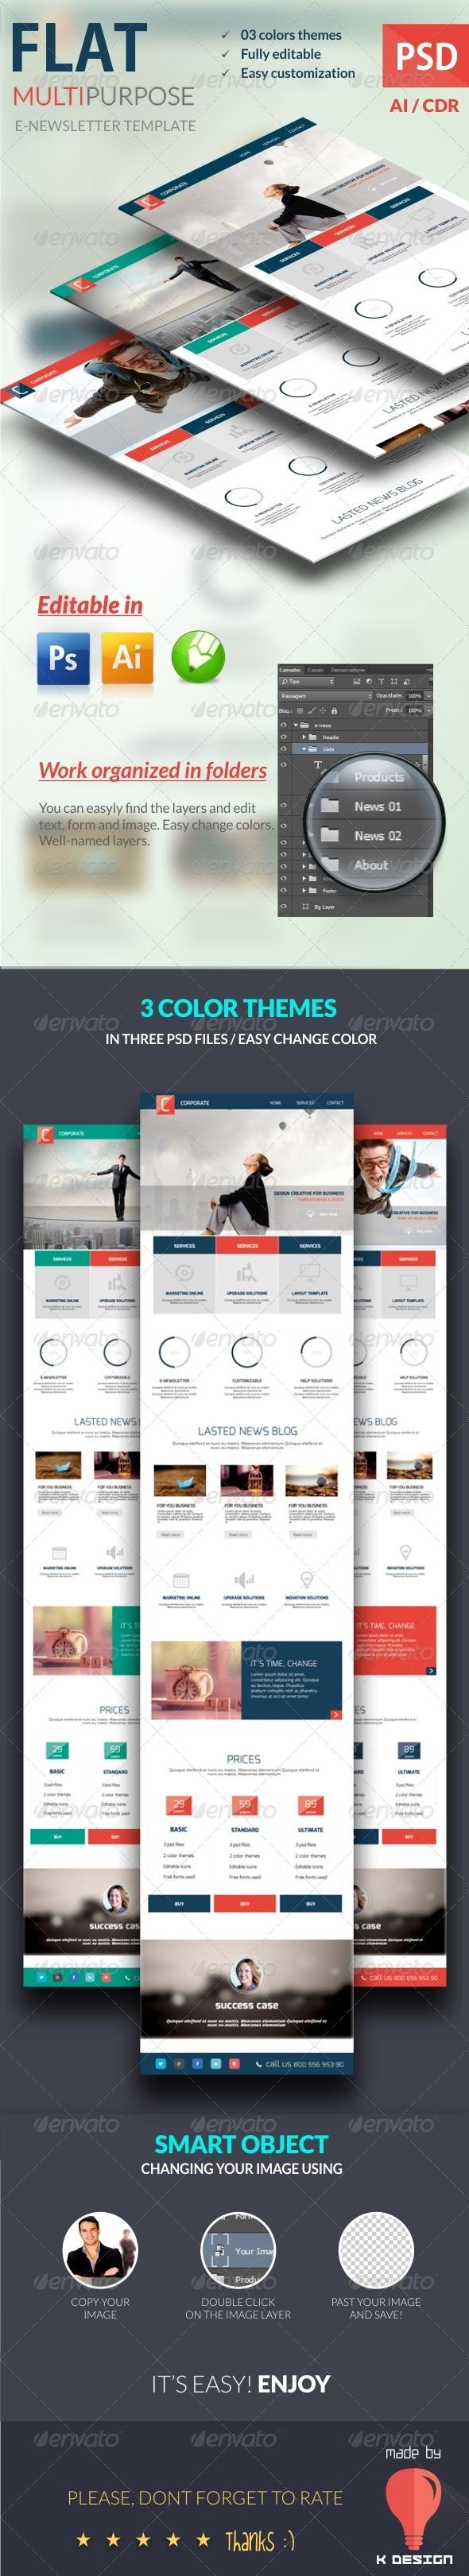 GraphicRiver Flat Multipurpose E-newsletter Template 8406062